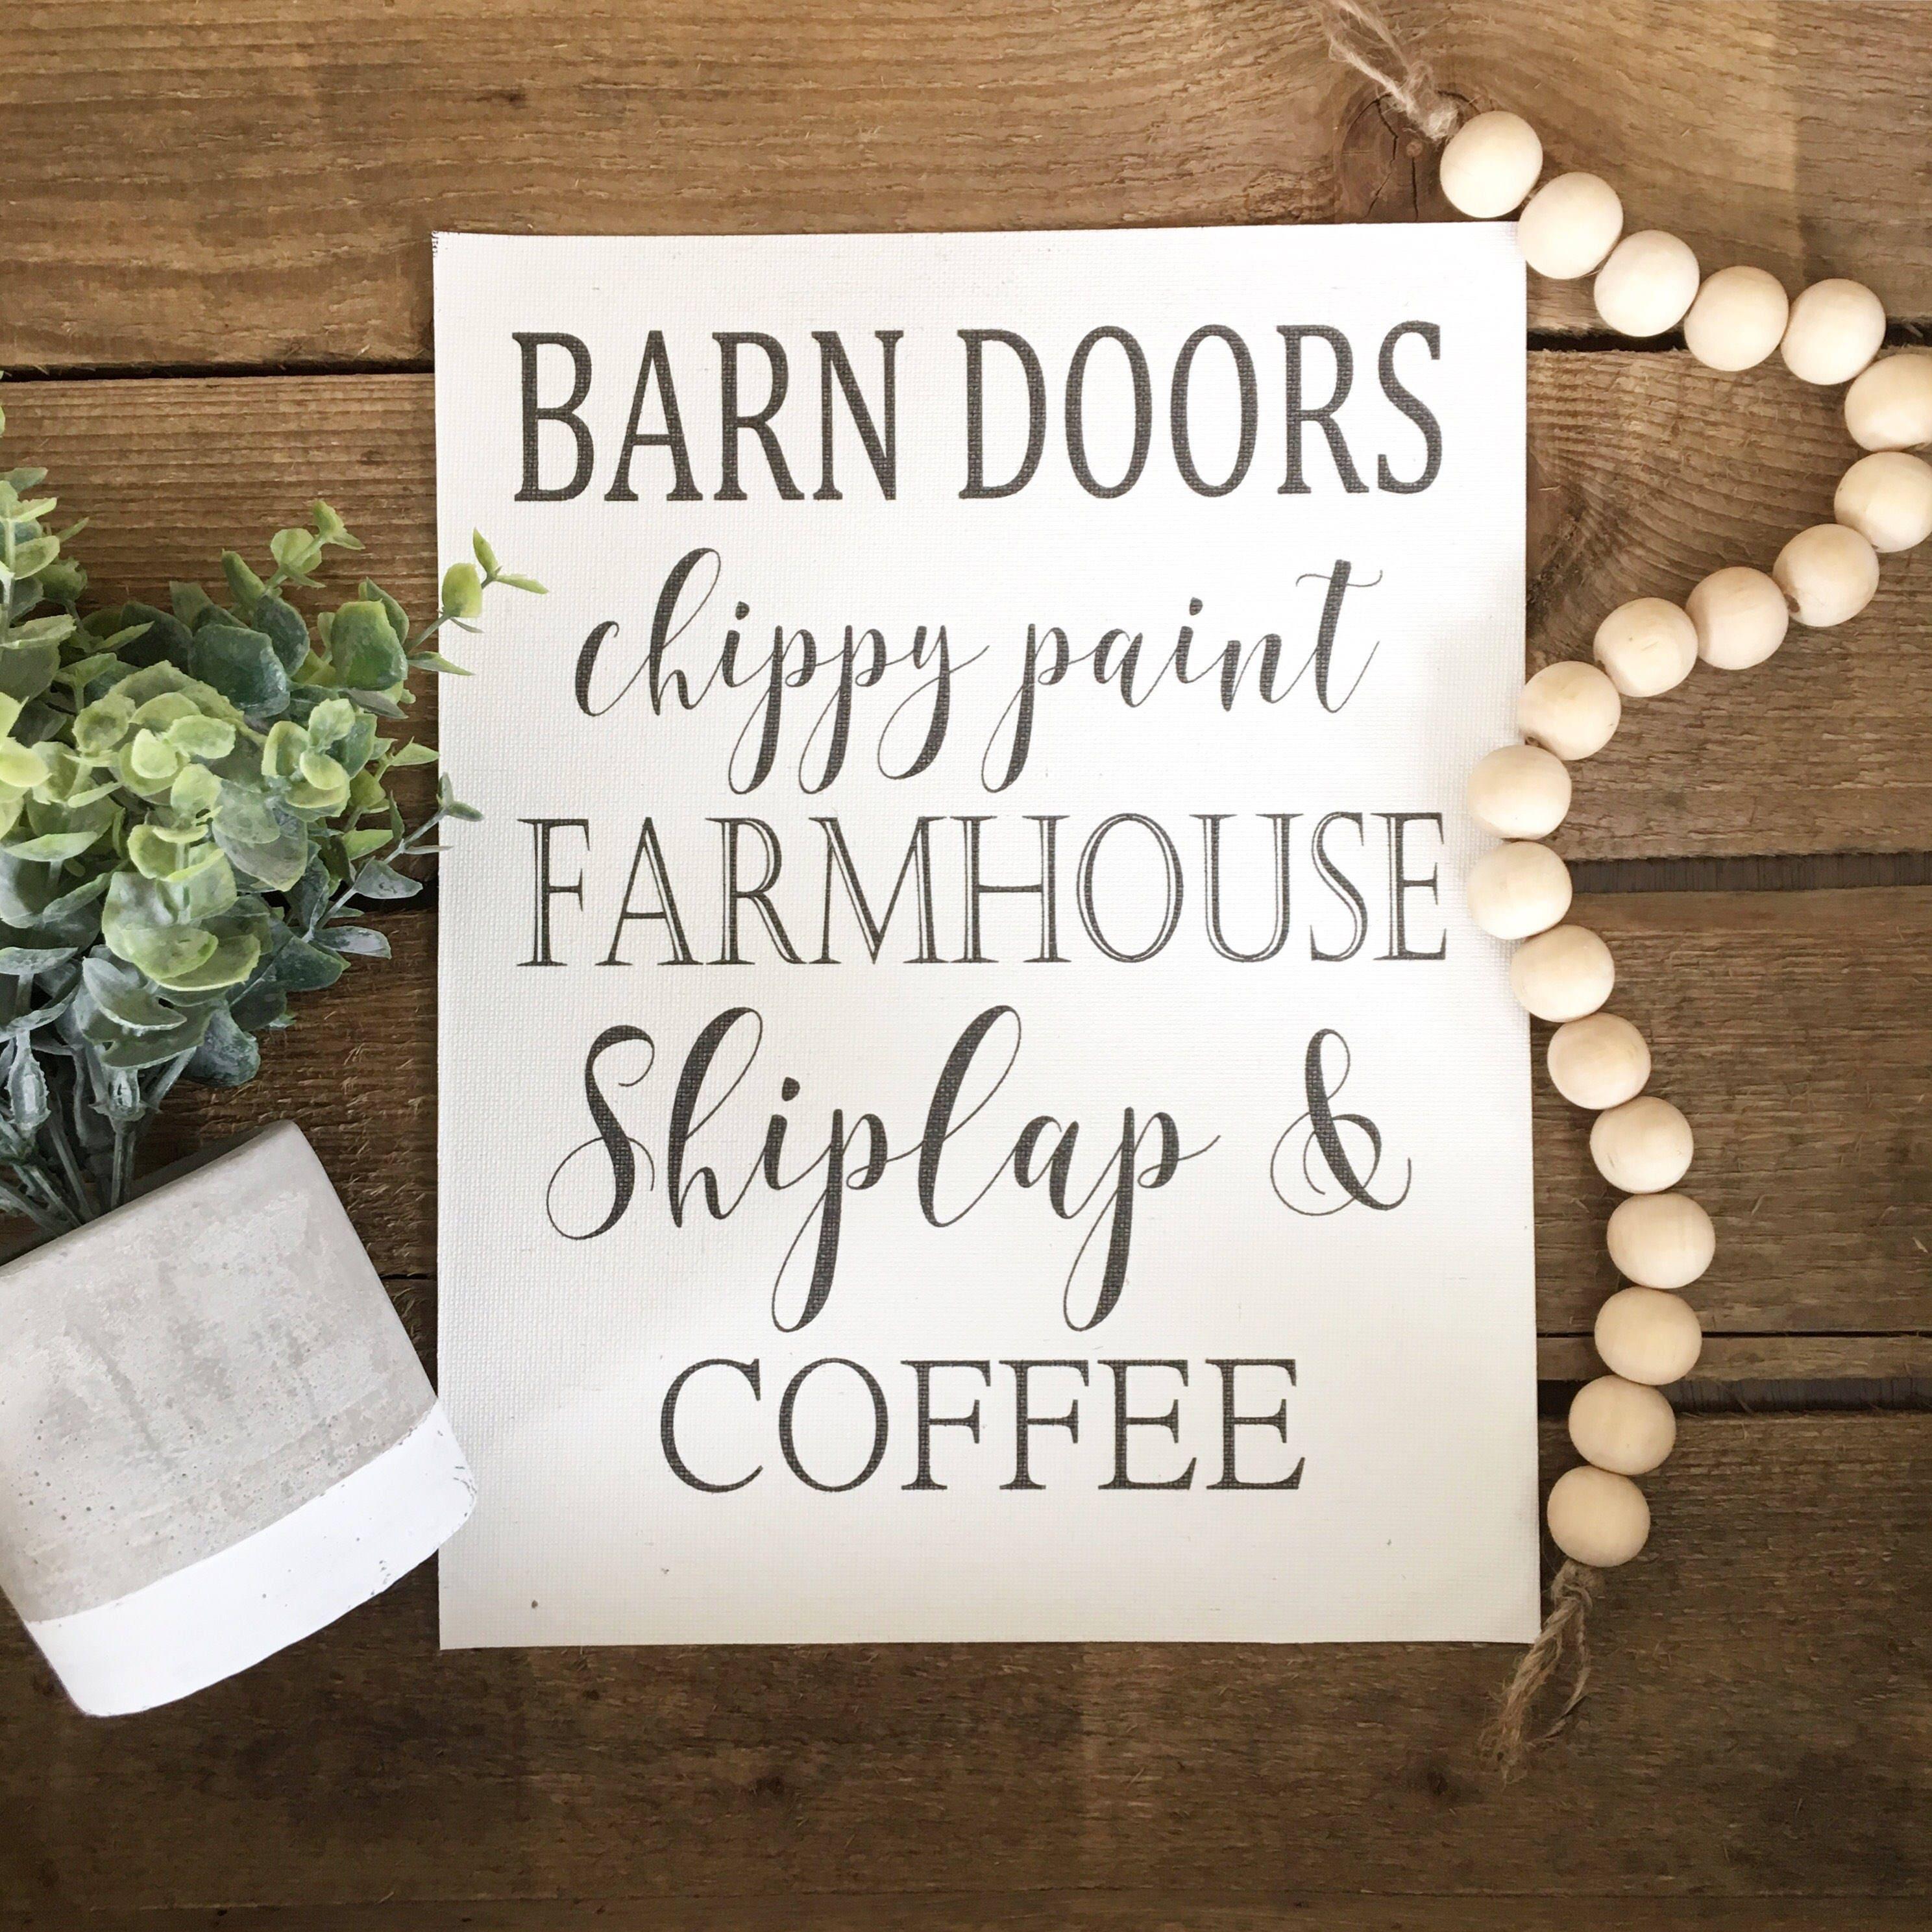 Gifts For A Farmhouse Decor Fan: Cotton Print Farmhouse Decor Farmhouse Shiplap Coffee